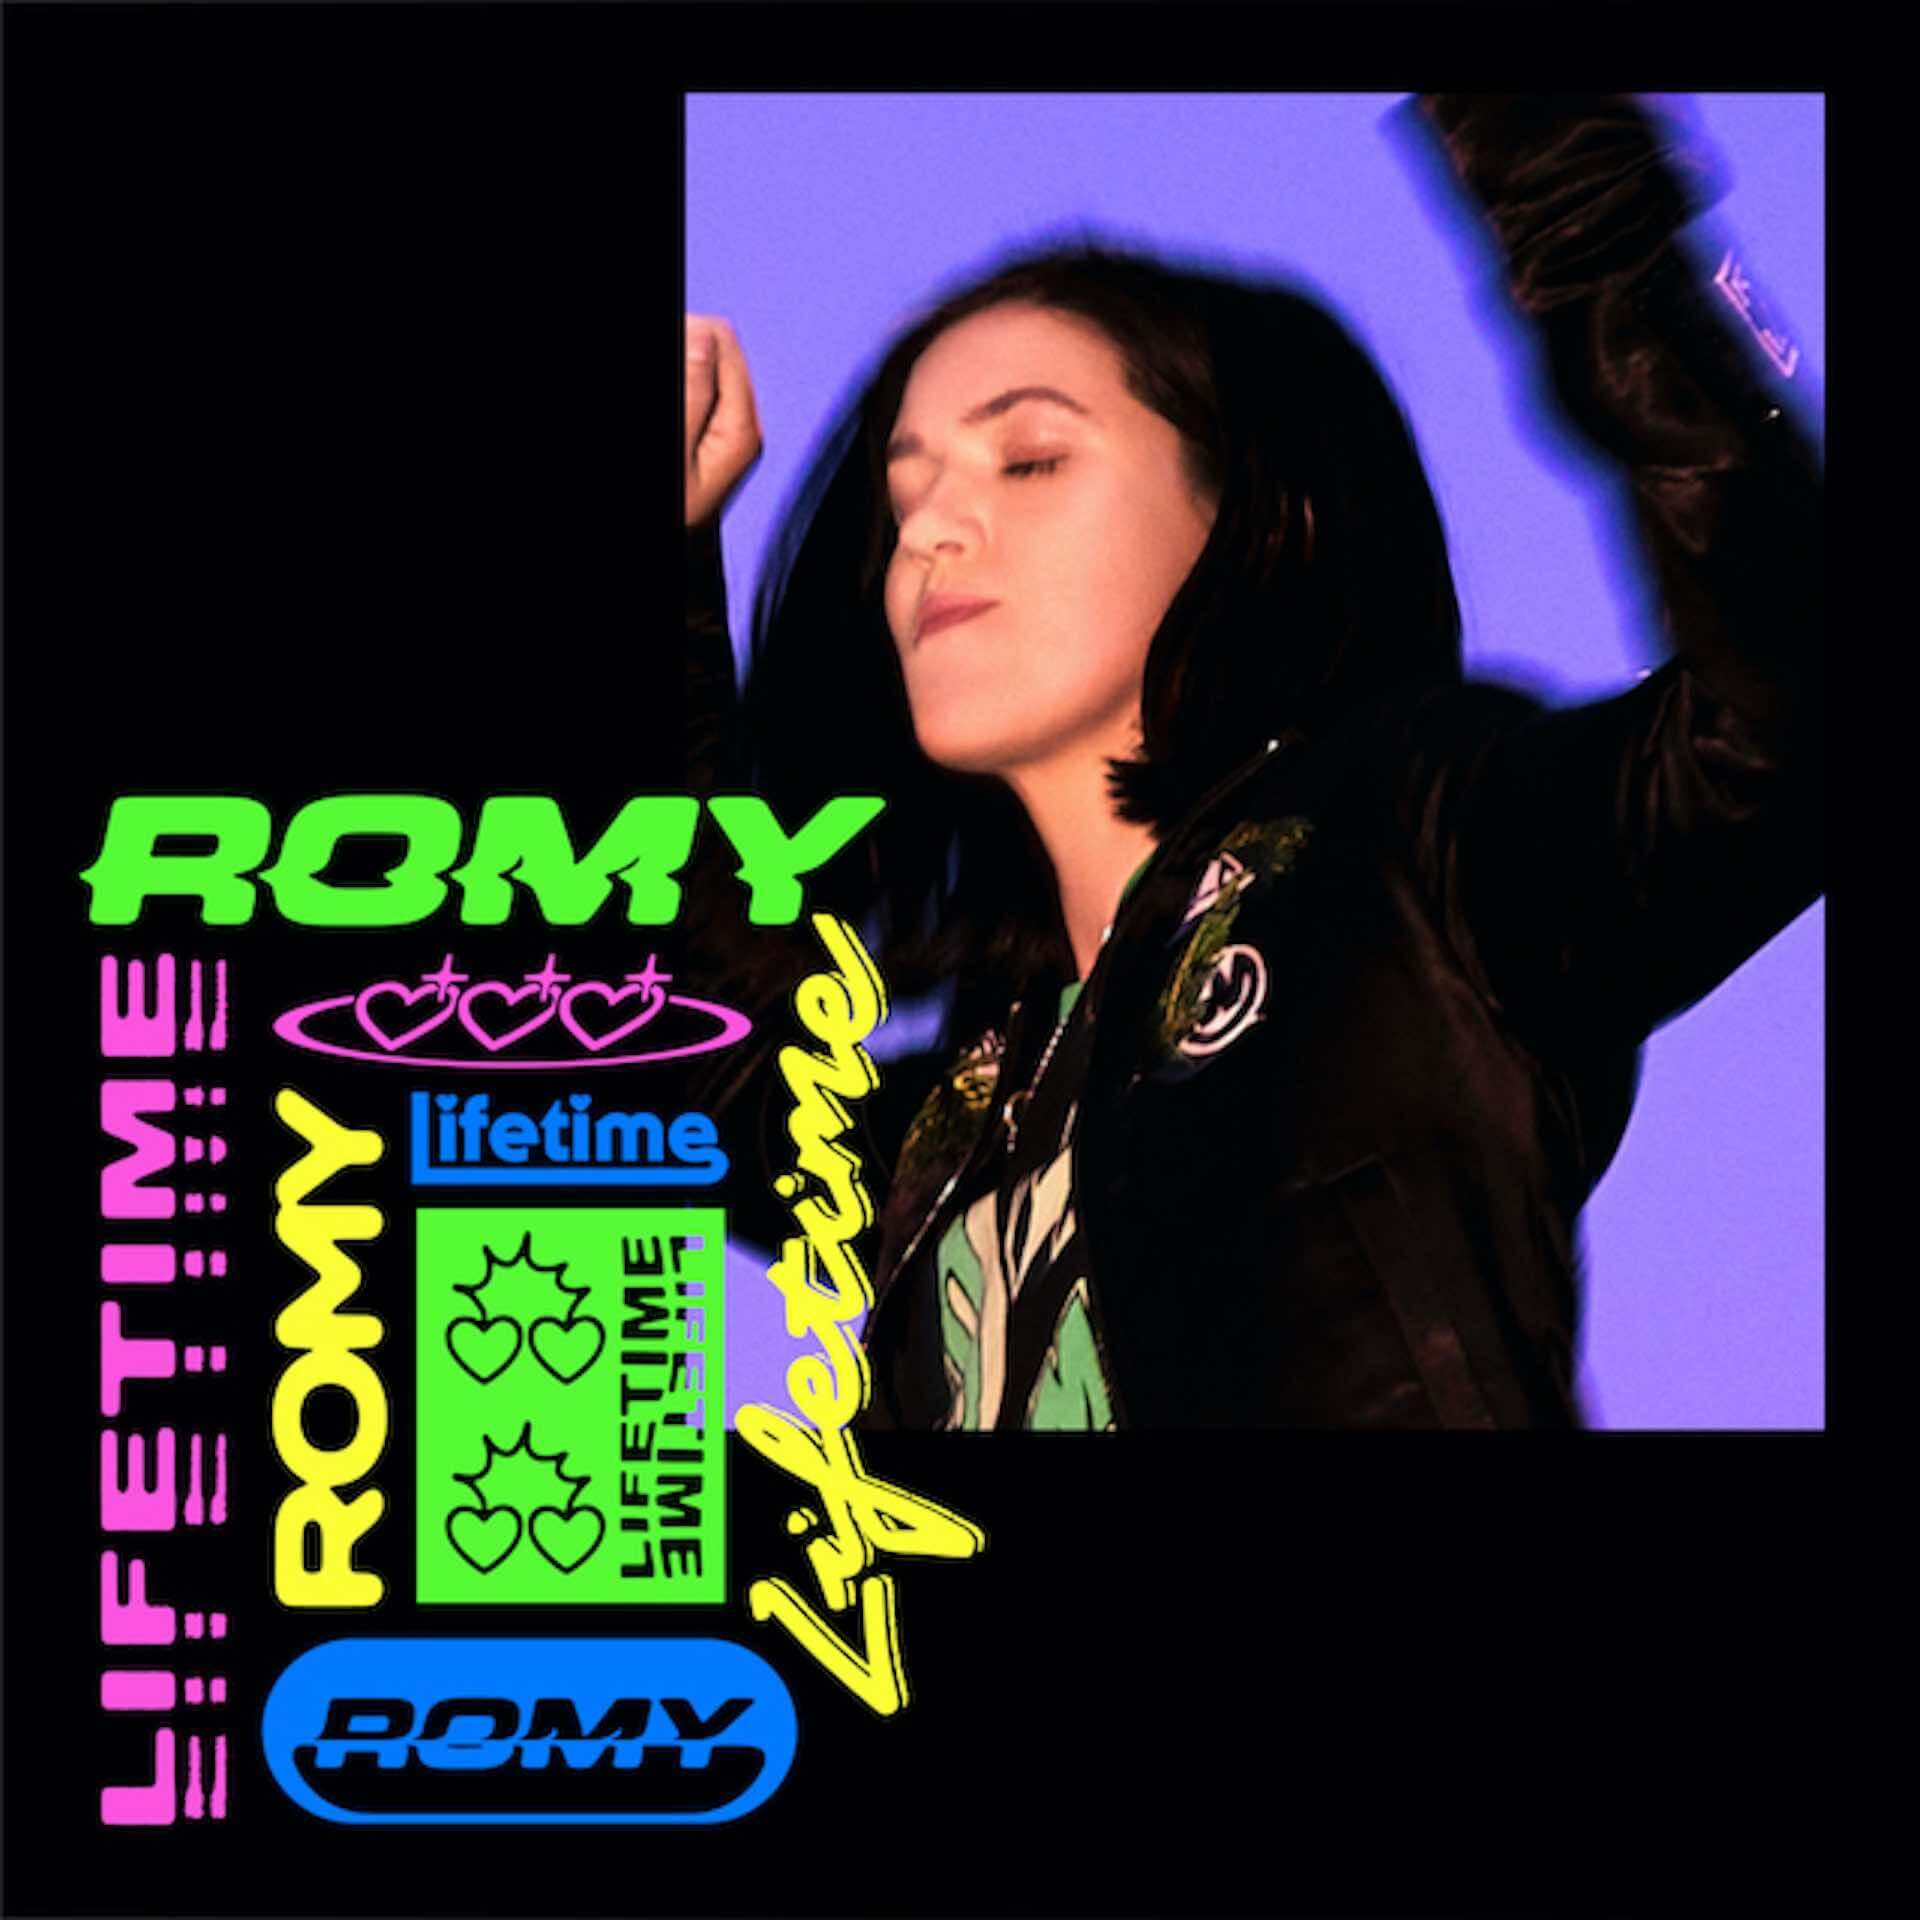 The xxのRomyとX-girlによるコラボアイテム第2弾が発表!本人出演のInstagramライブも実施決定 music210208_romy_8-1920x1920